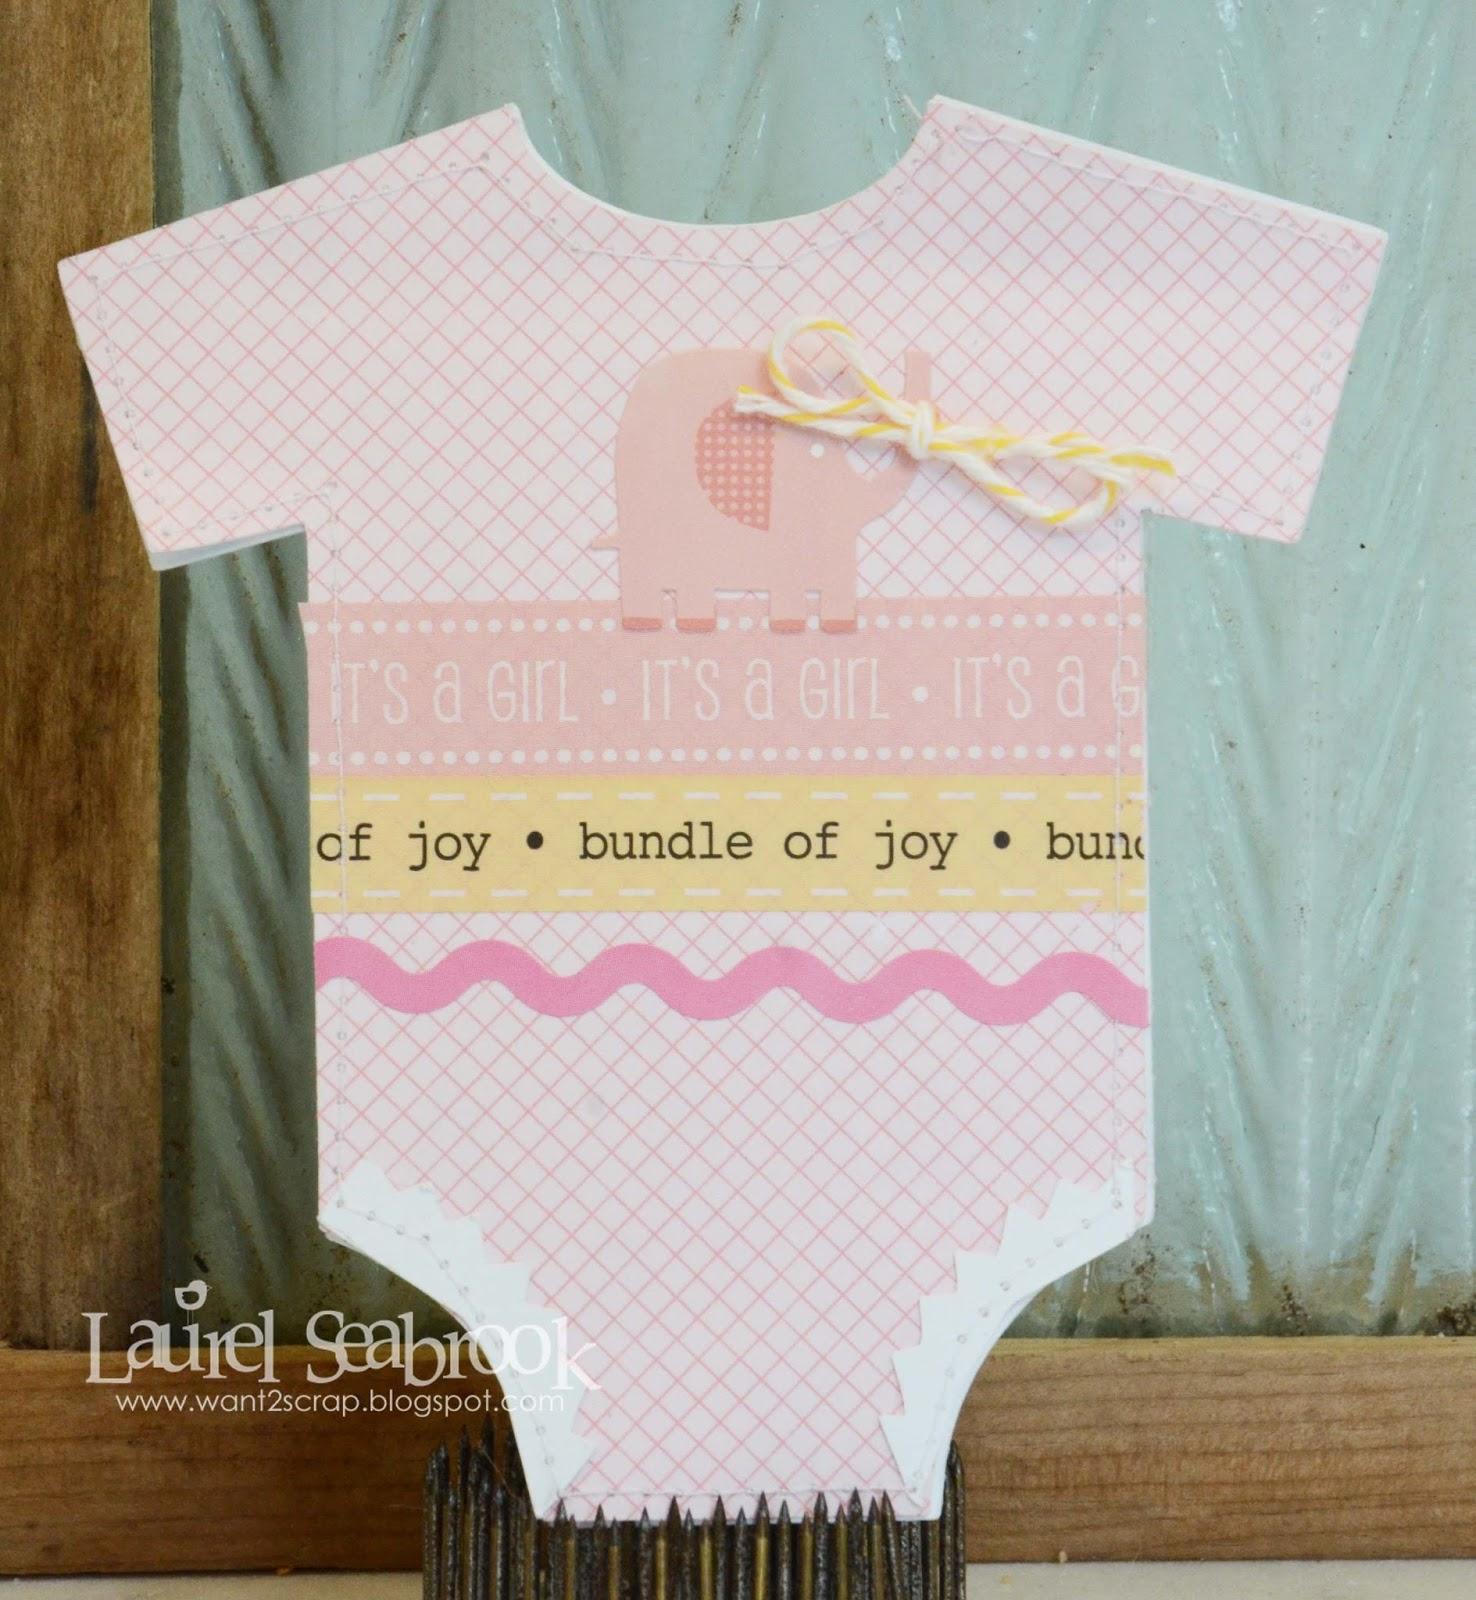 SRM Stickers Blog - Bundle of Joy Card by Laurel -#card #diecut #borders #stickers